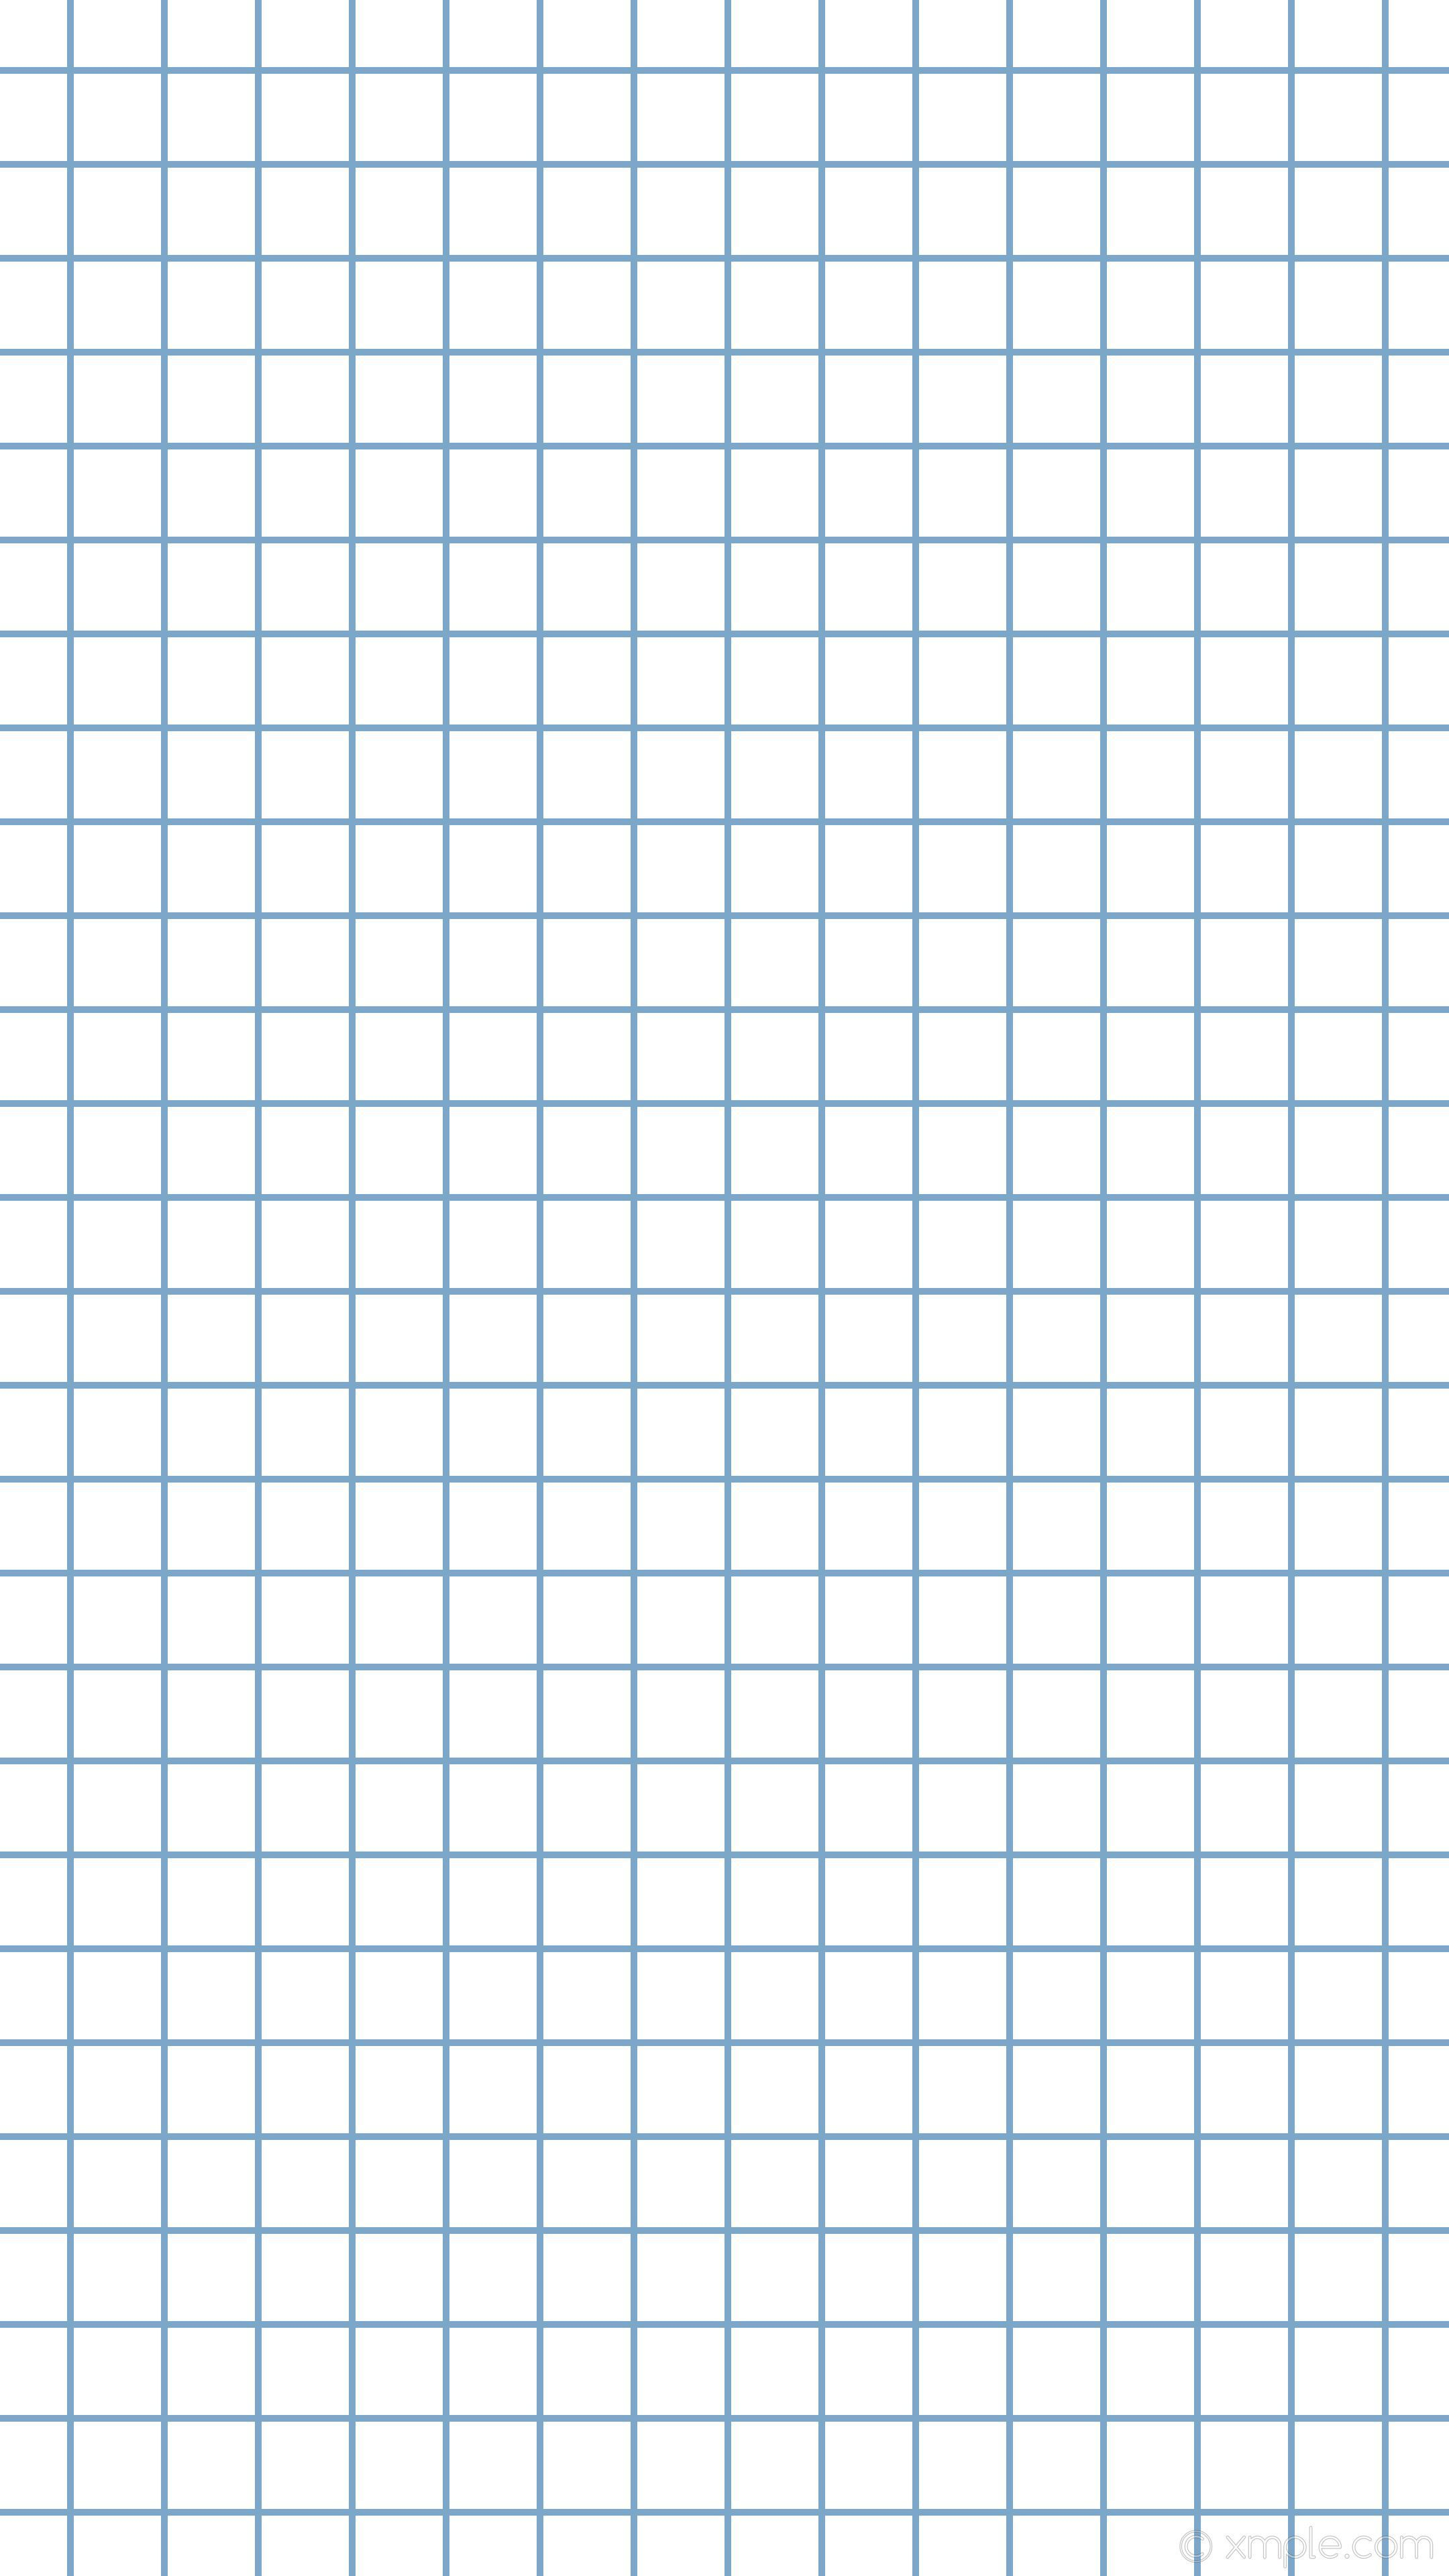 Download Wallpaper Aesthetic Grid Cikimmcom Grid wallpaper 2160x3840